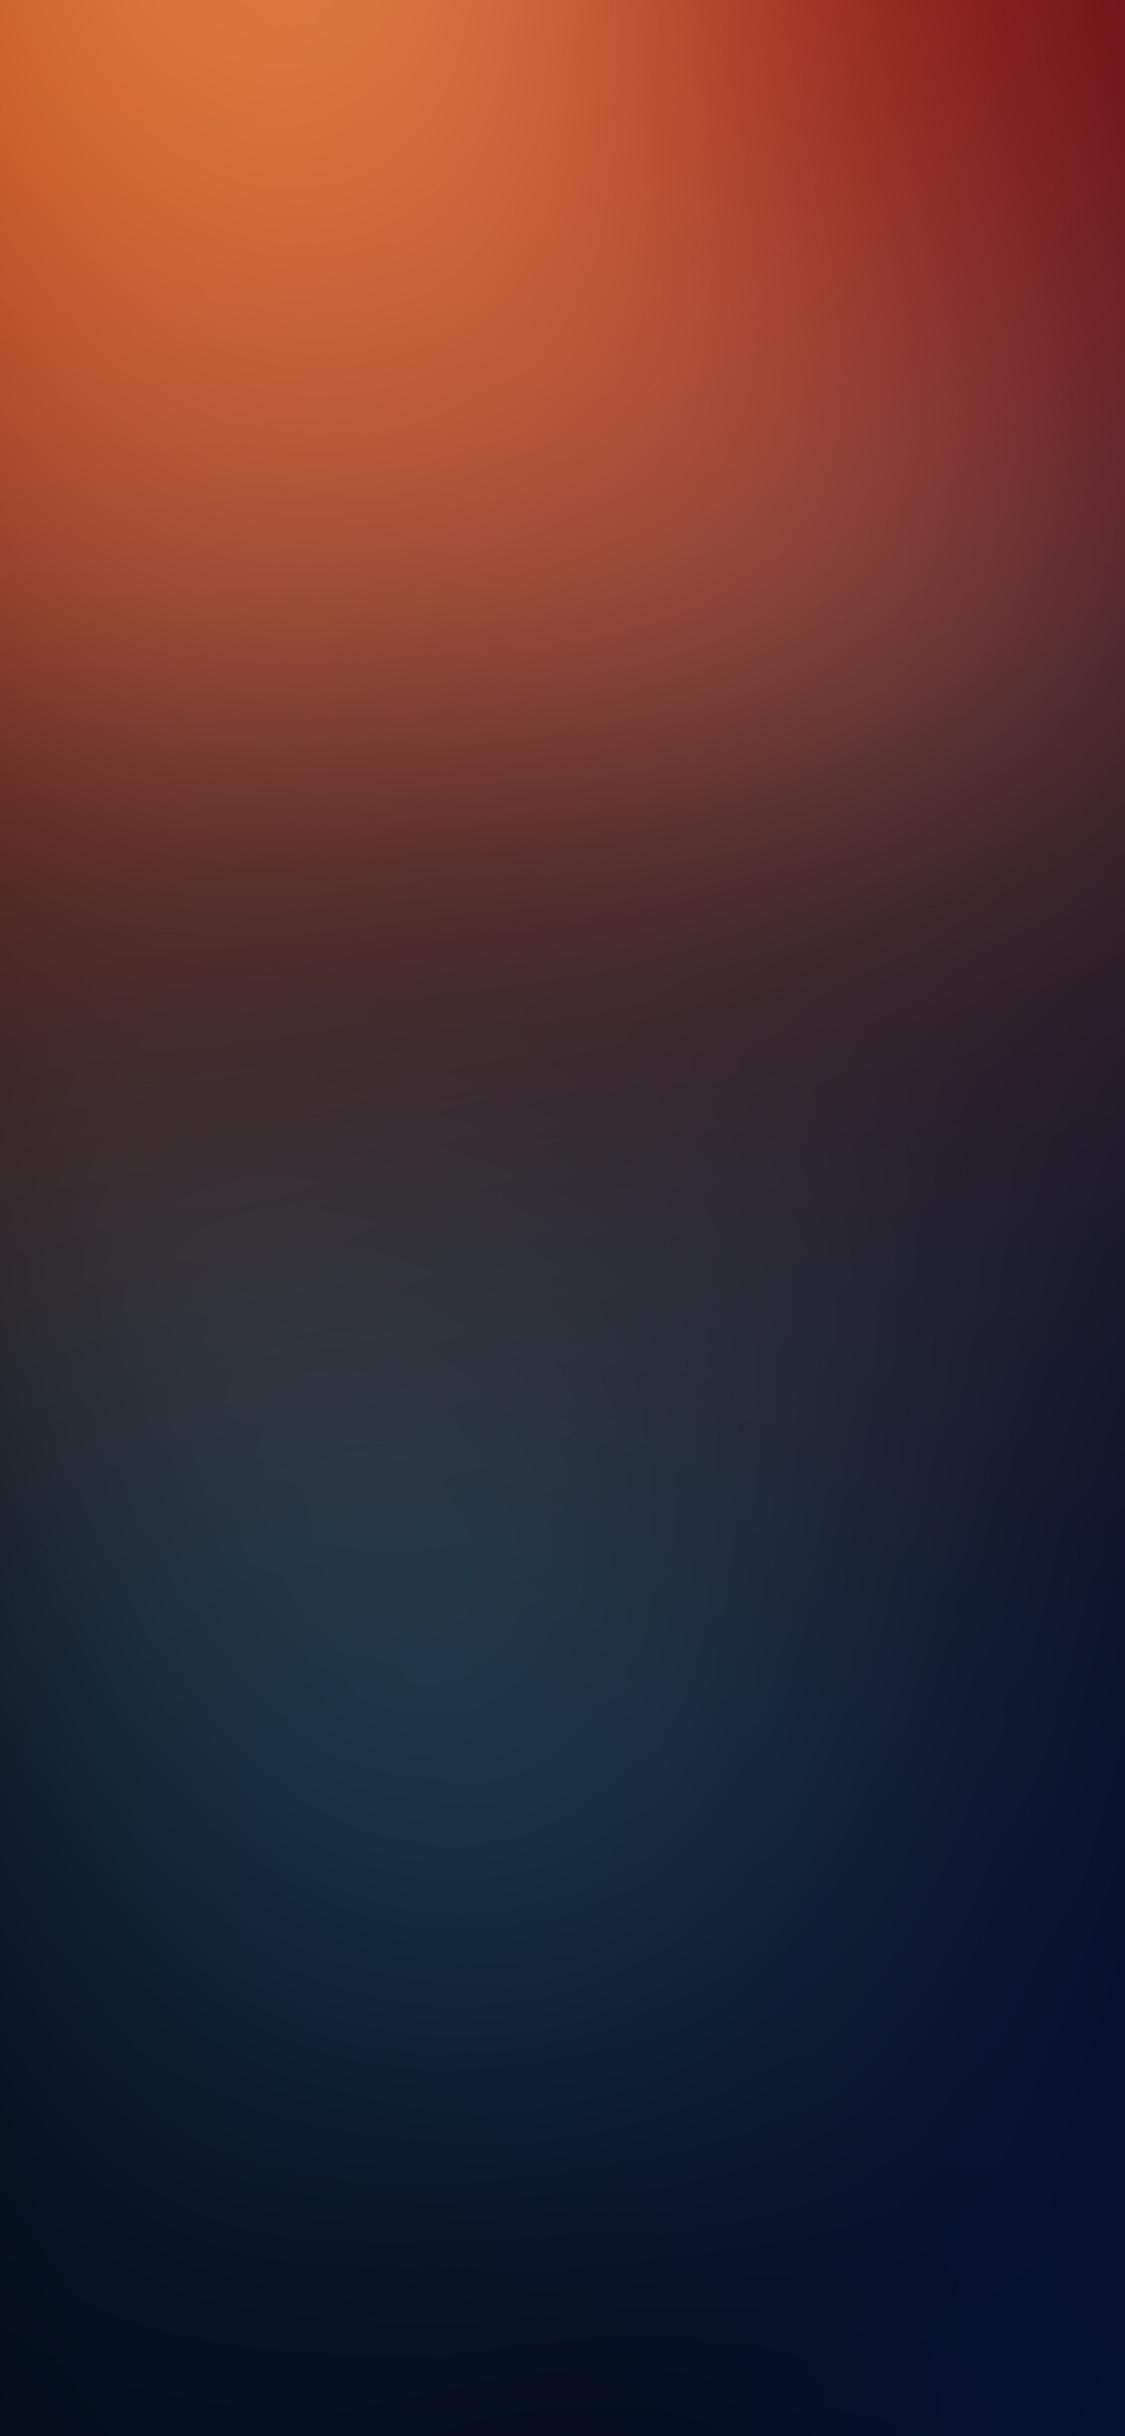 iPhoneXpapers.com-Apple-iPhone-wallpaper-sk80-red-blue-blur-gradation